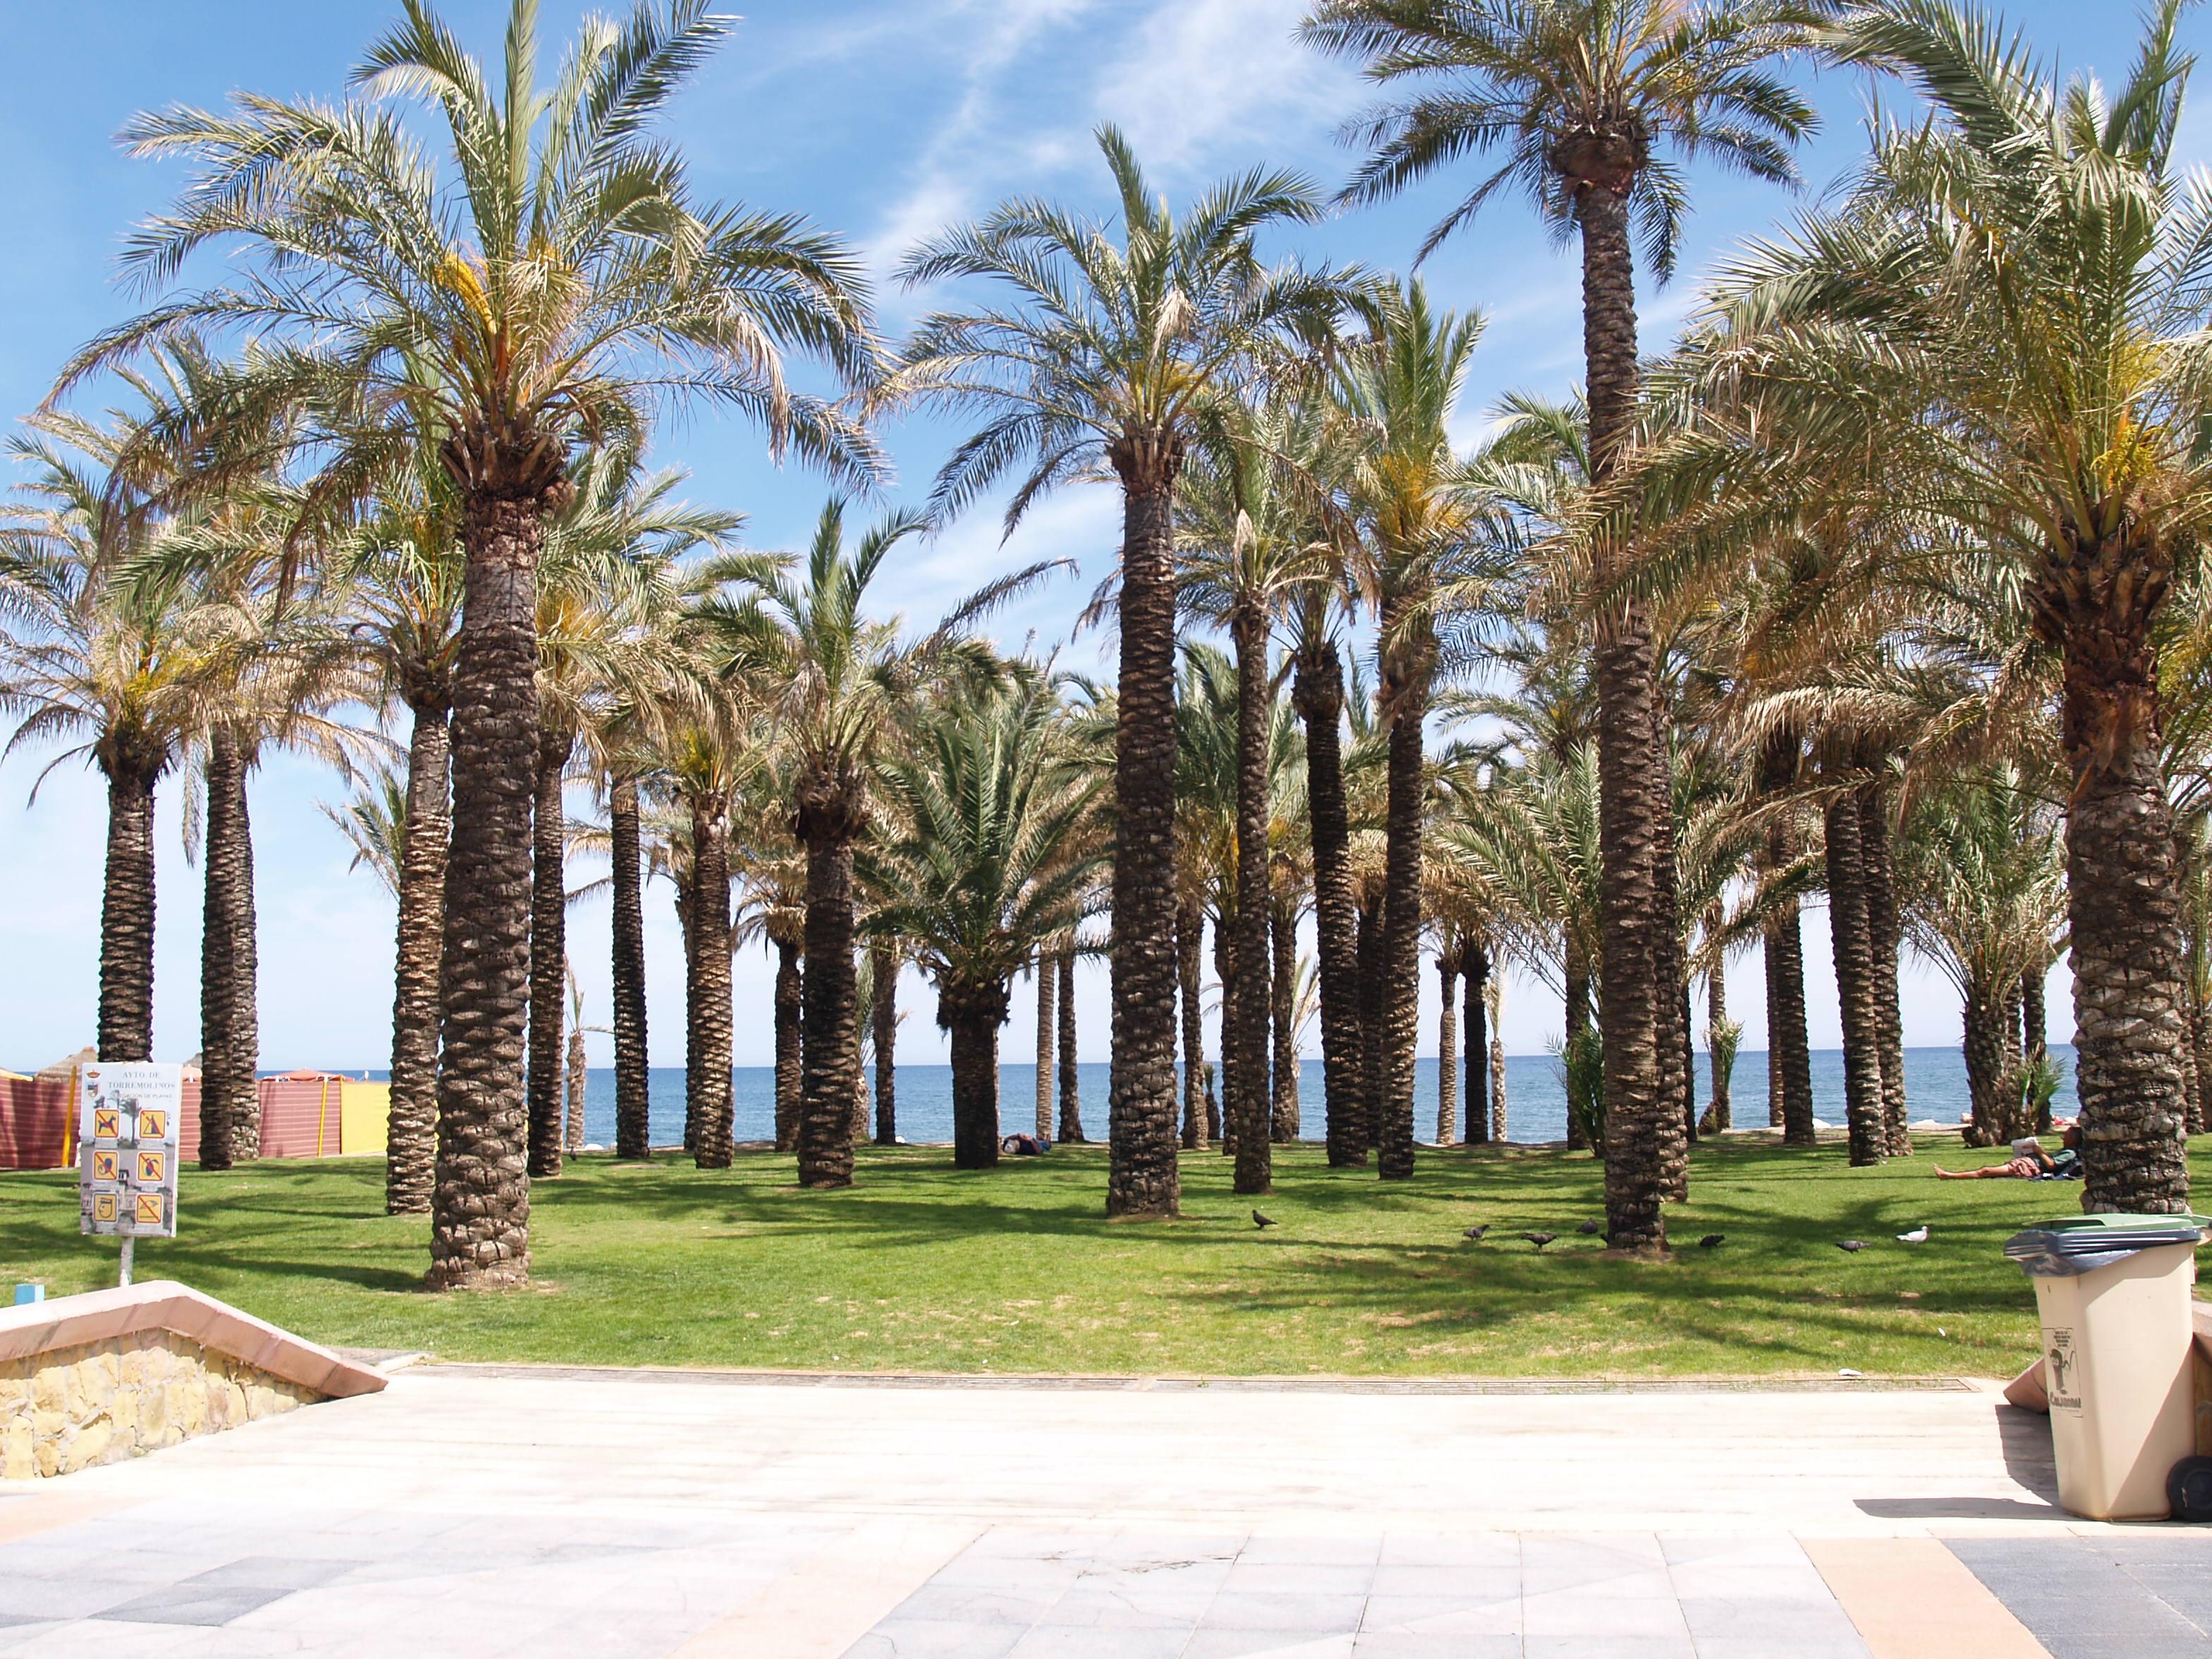 Palms in Torremolinos